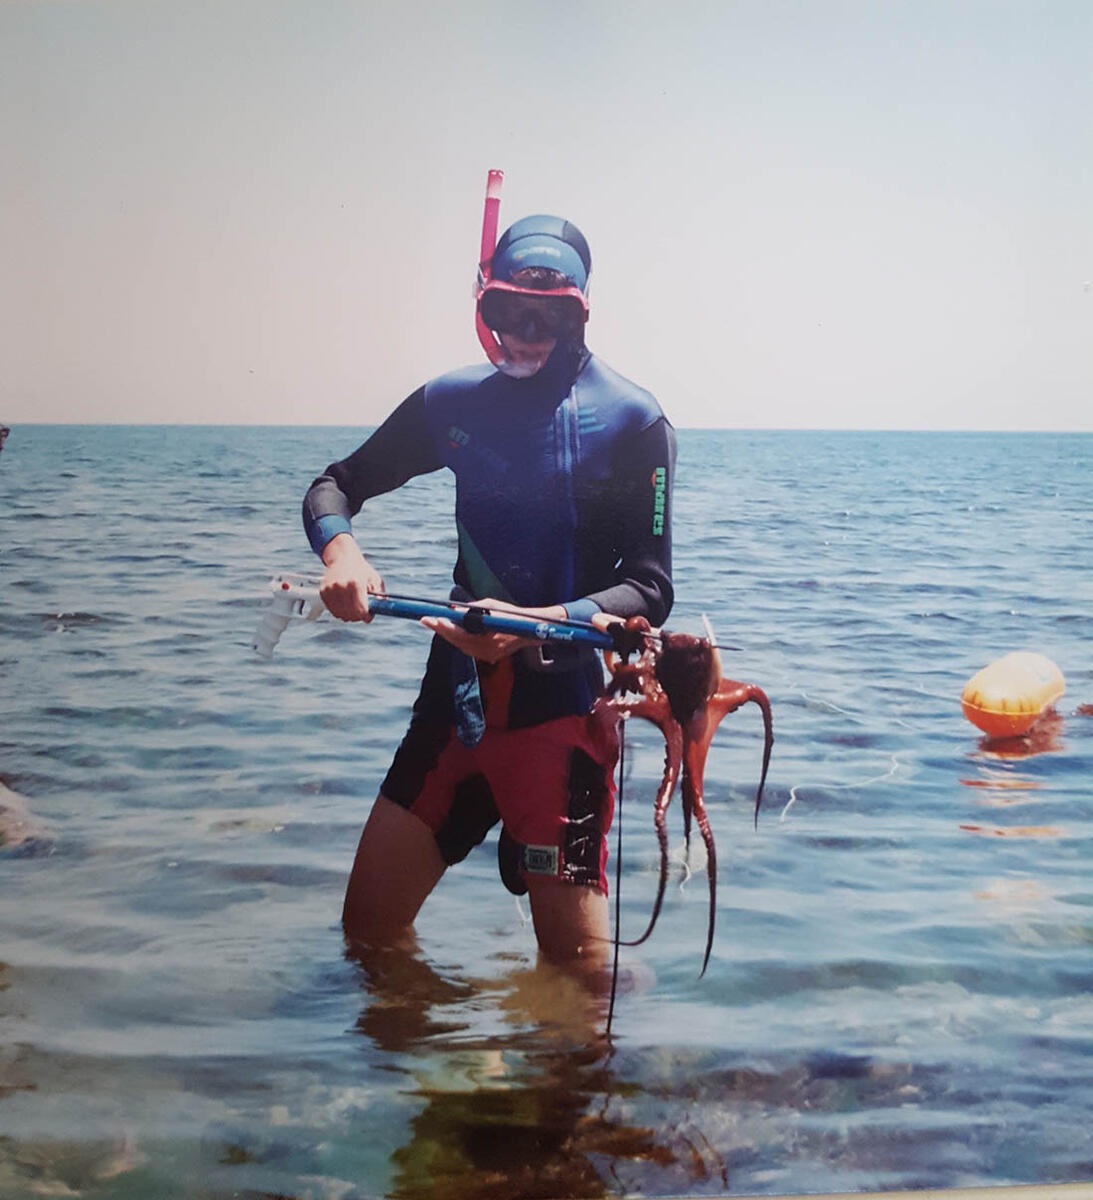 Traje Mares Spearfishing